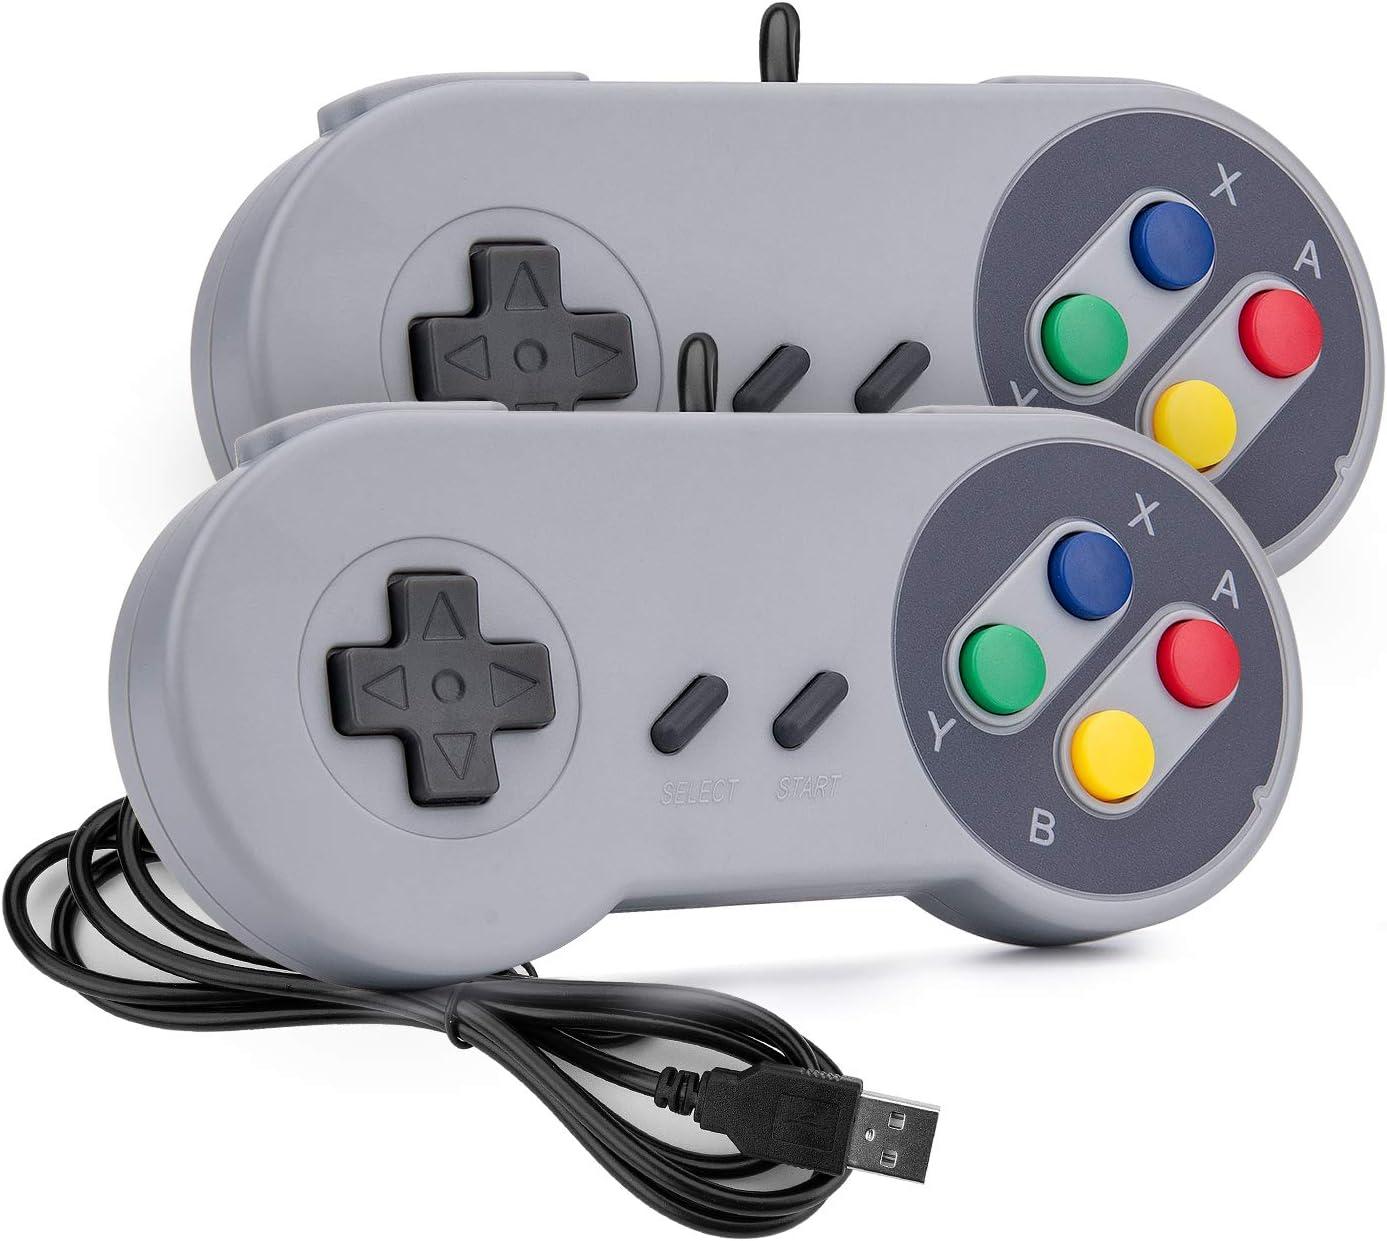 Mafiti Game Controller SNES Retro USB Controller Joystick for Windows PC MAC Linux Raspberry Pi 2 Pack